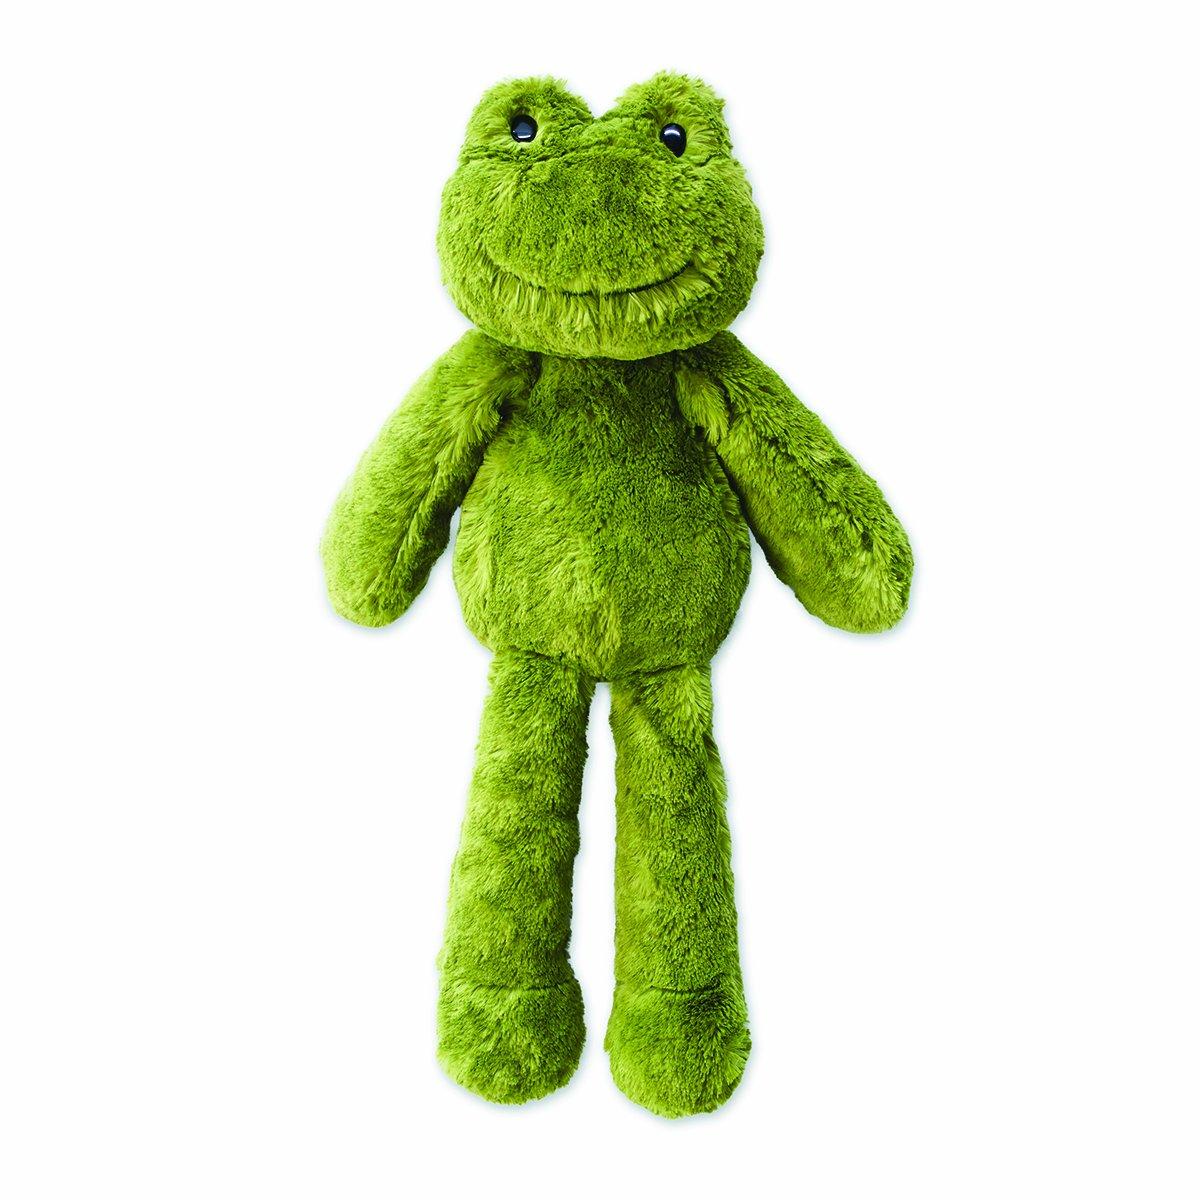 Nat and Jules Fredo Loungerz Frog Friend Children's Plush Stuffed Animal Toy